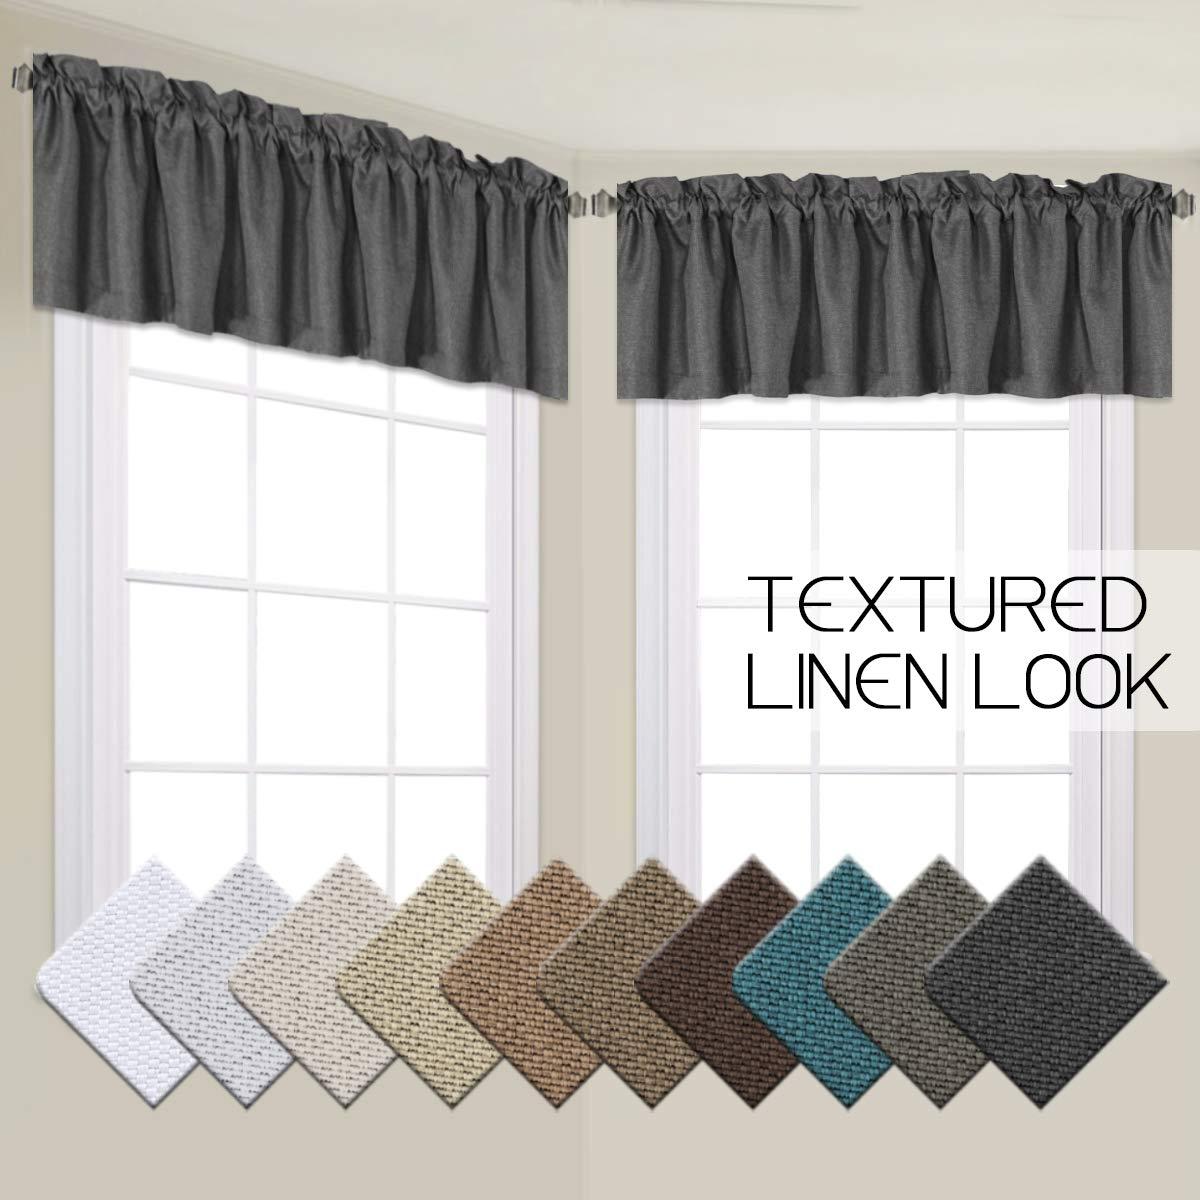 VERSAILTEX Energy Saving Textured Linen Curtain Valances